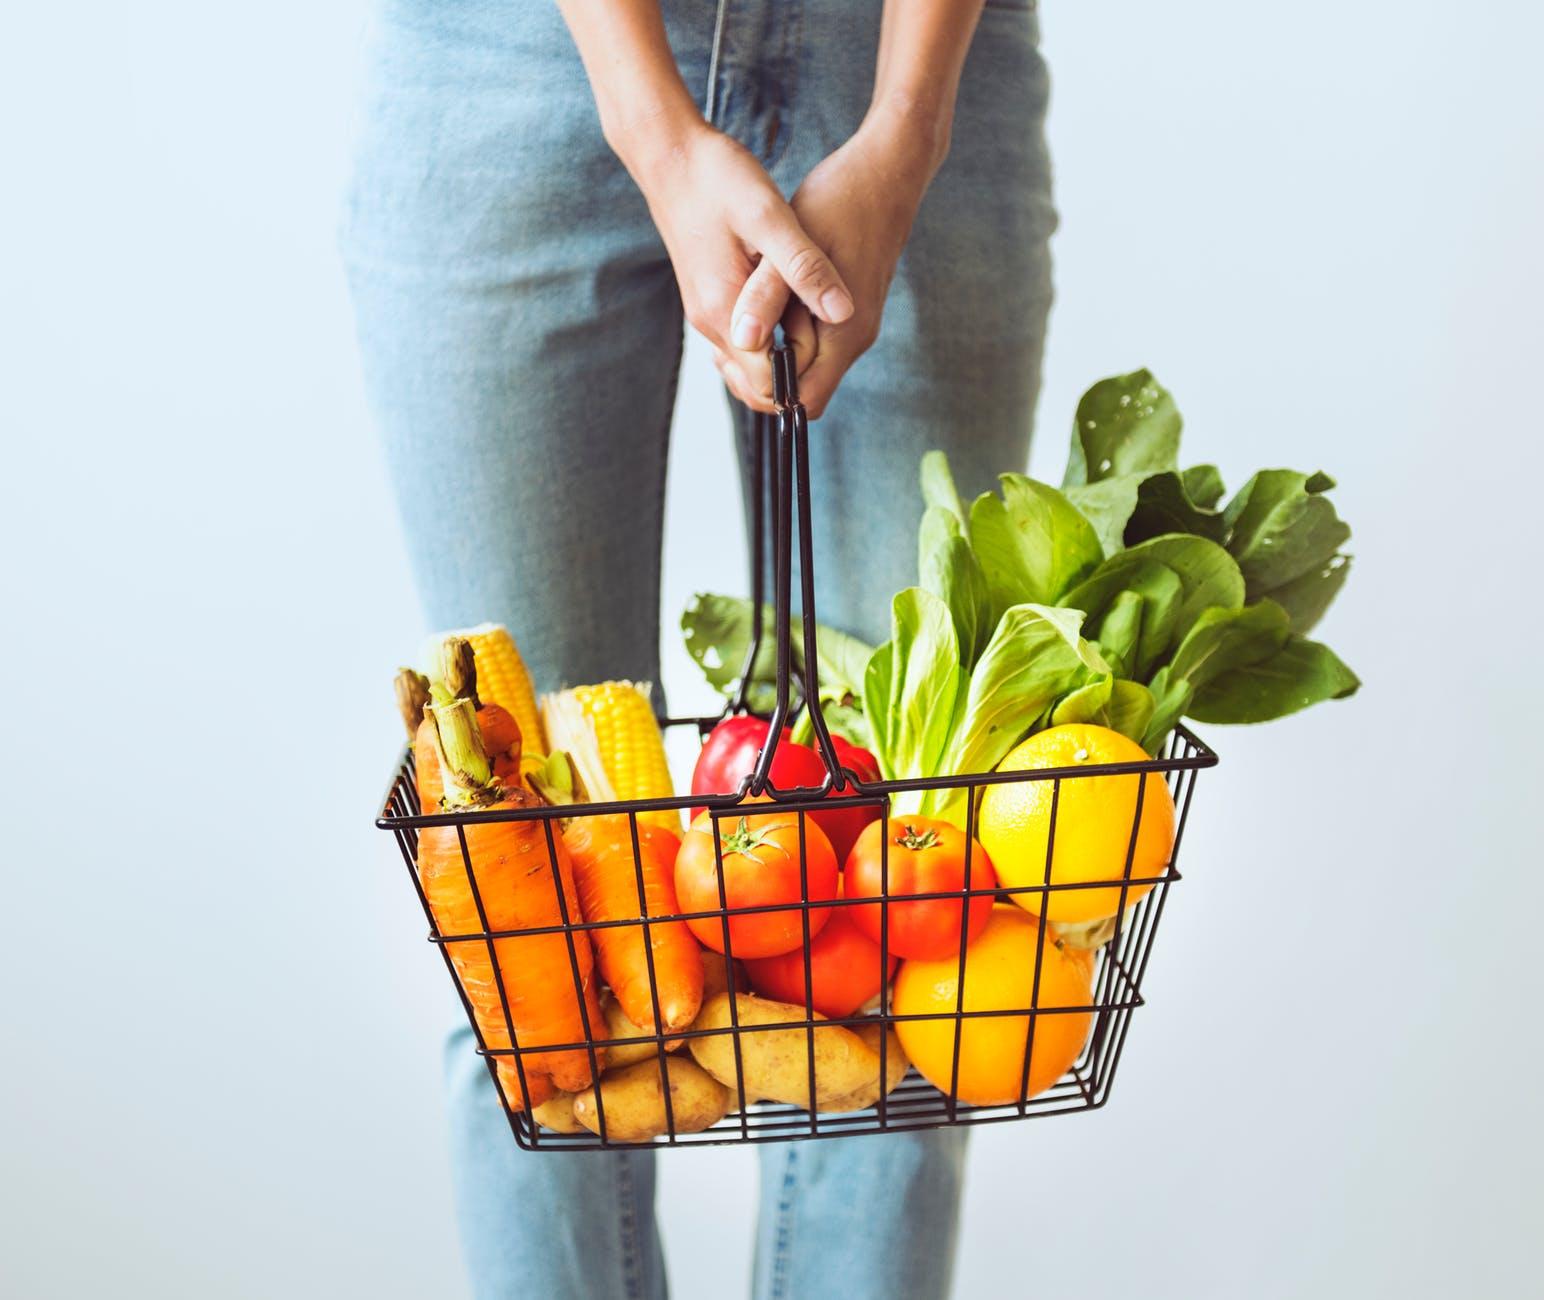 zena noge vitamini hrana kupovina voce povrce